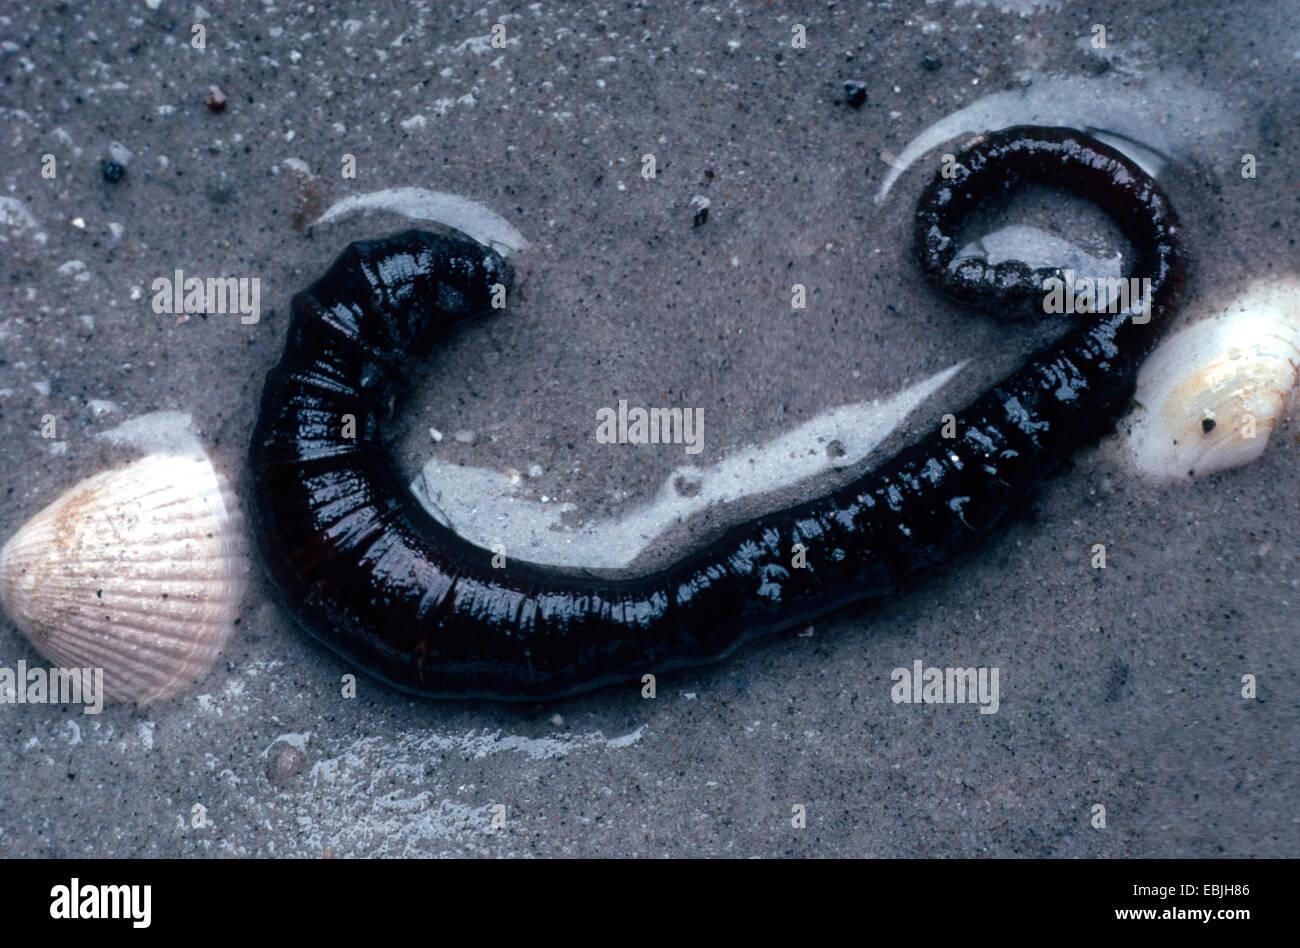 European lug worm, blow lug, lugworm (Arenicola marina), lying in the sand, Germany - Stock Image